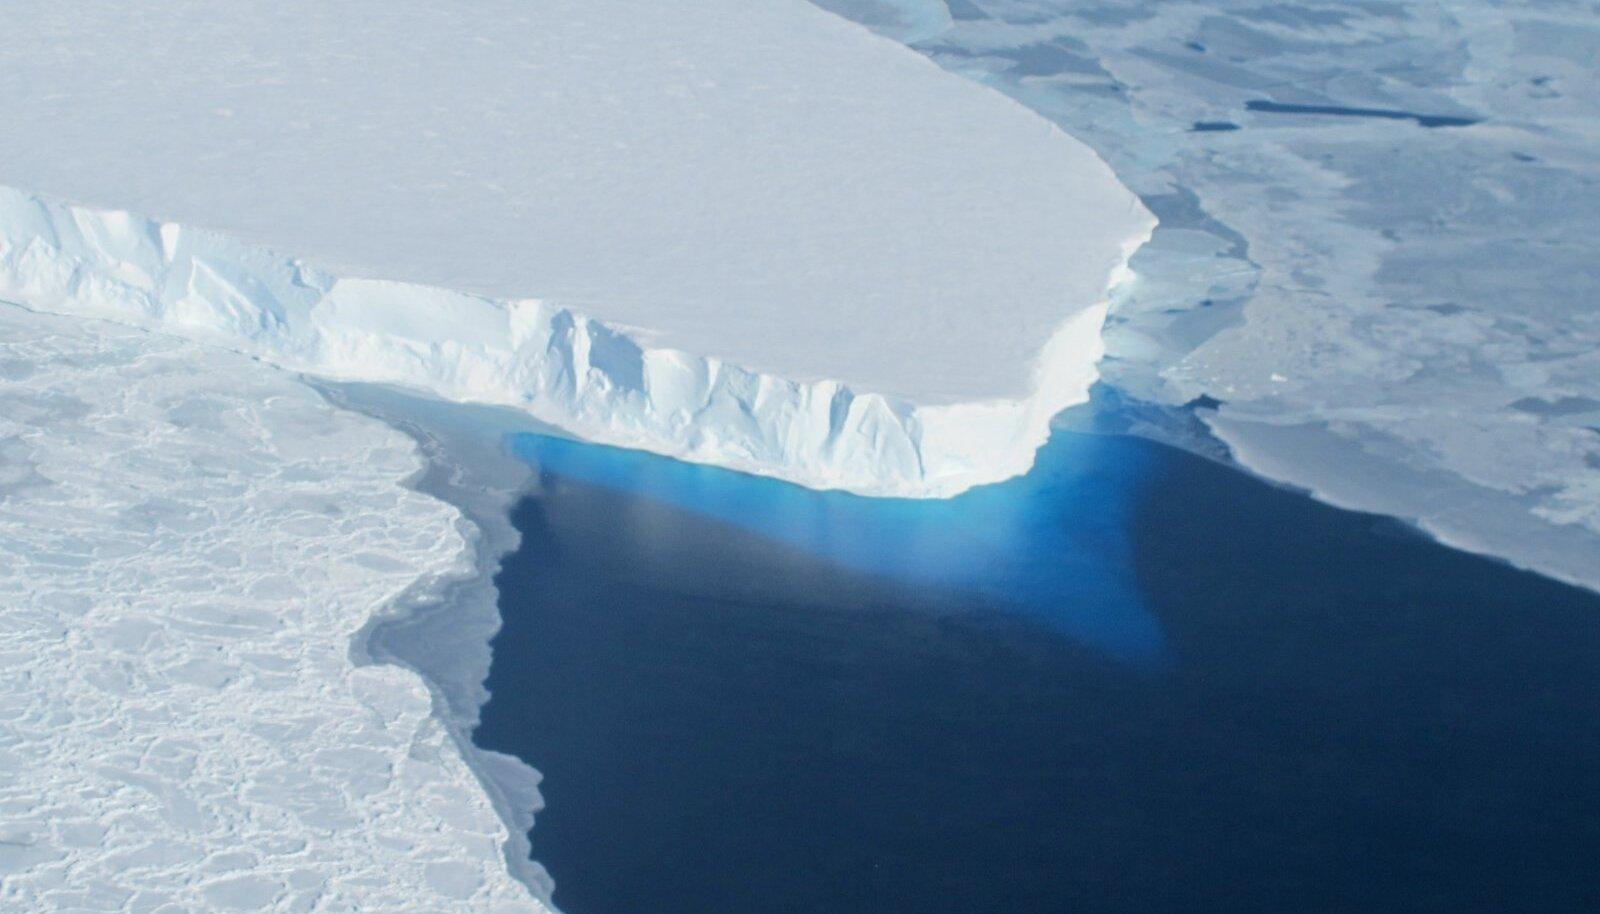 Thwaitesi liustiku osa (Foto: Wikimedia Commons / NASA ICE, James Yungel)